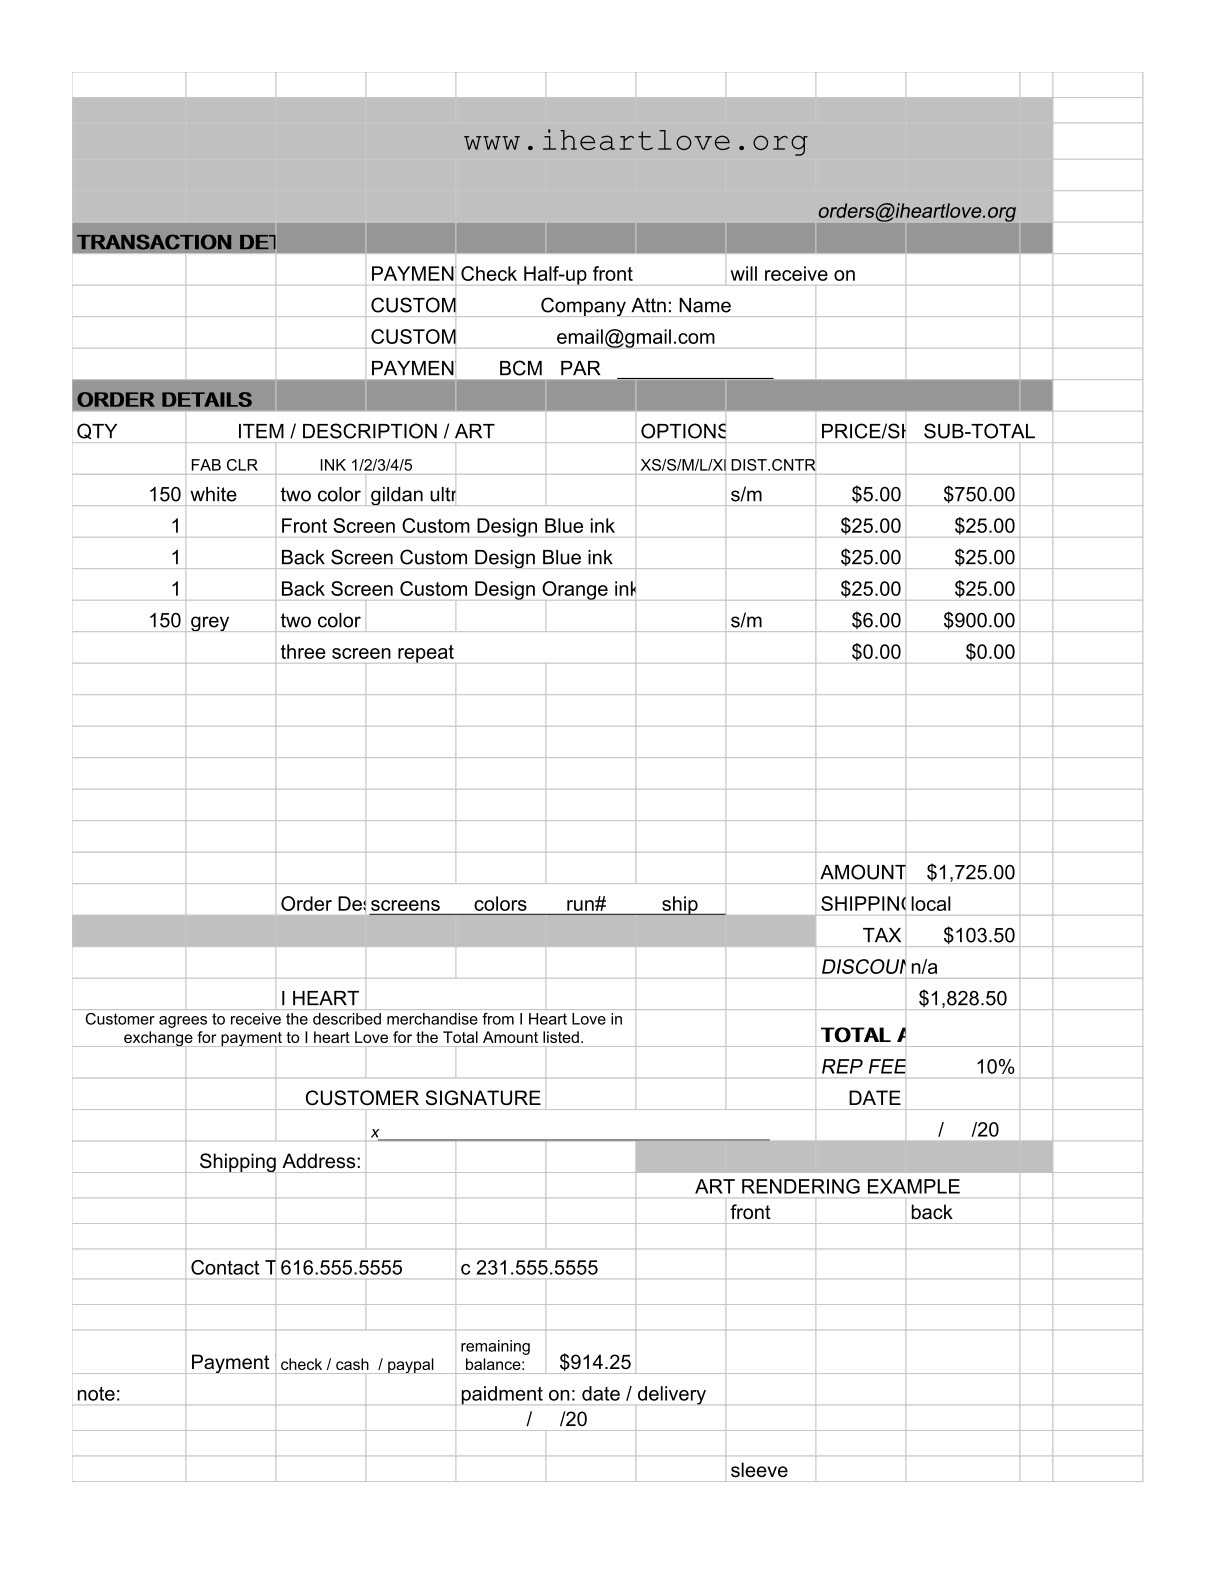 Film Invoice Templates Images - Film invoice template